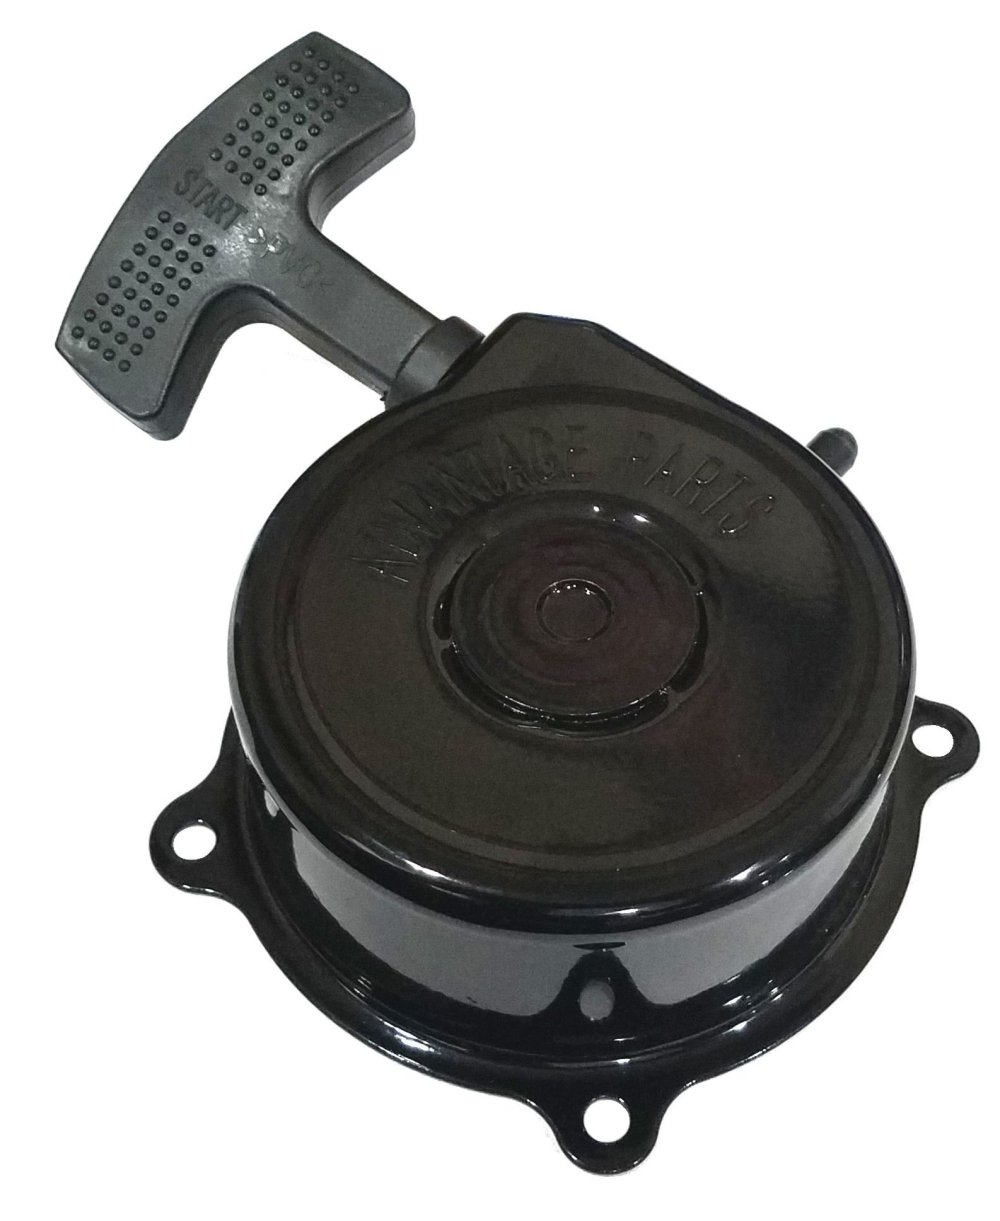 medium resolution of suzuki pull start starter recoil lt a50 alt50 lt50 lt 50 quad master 2002